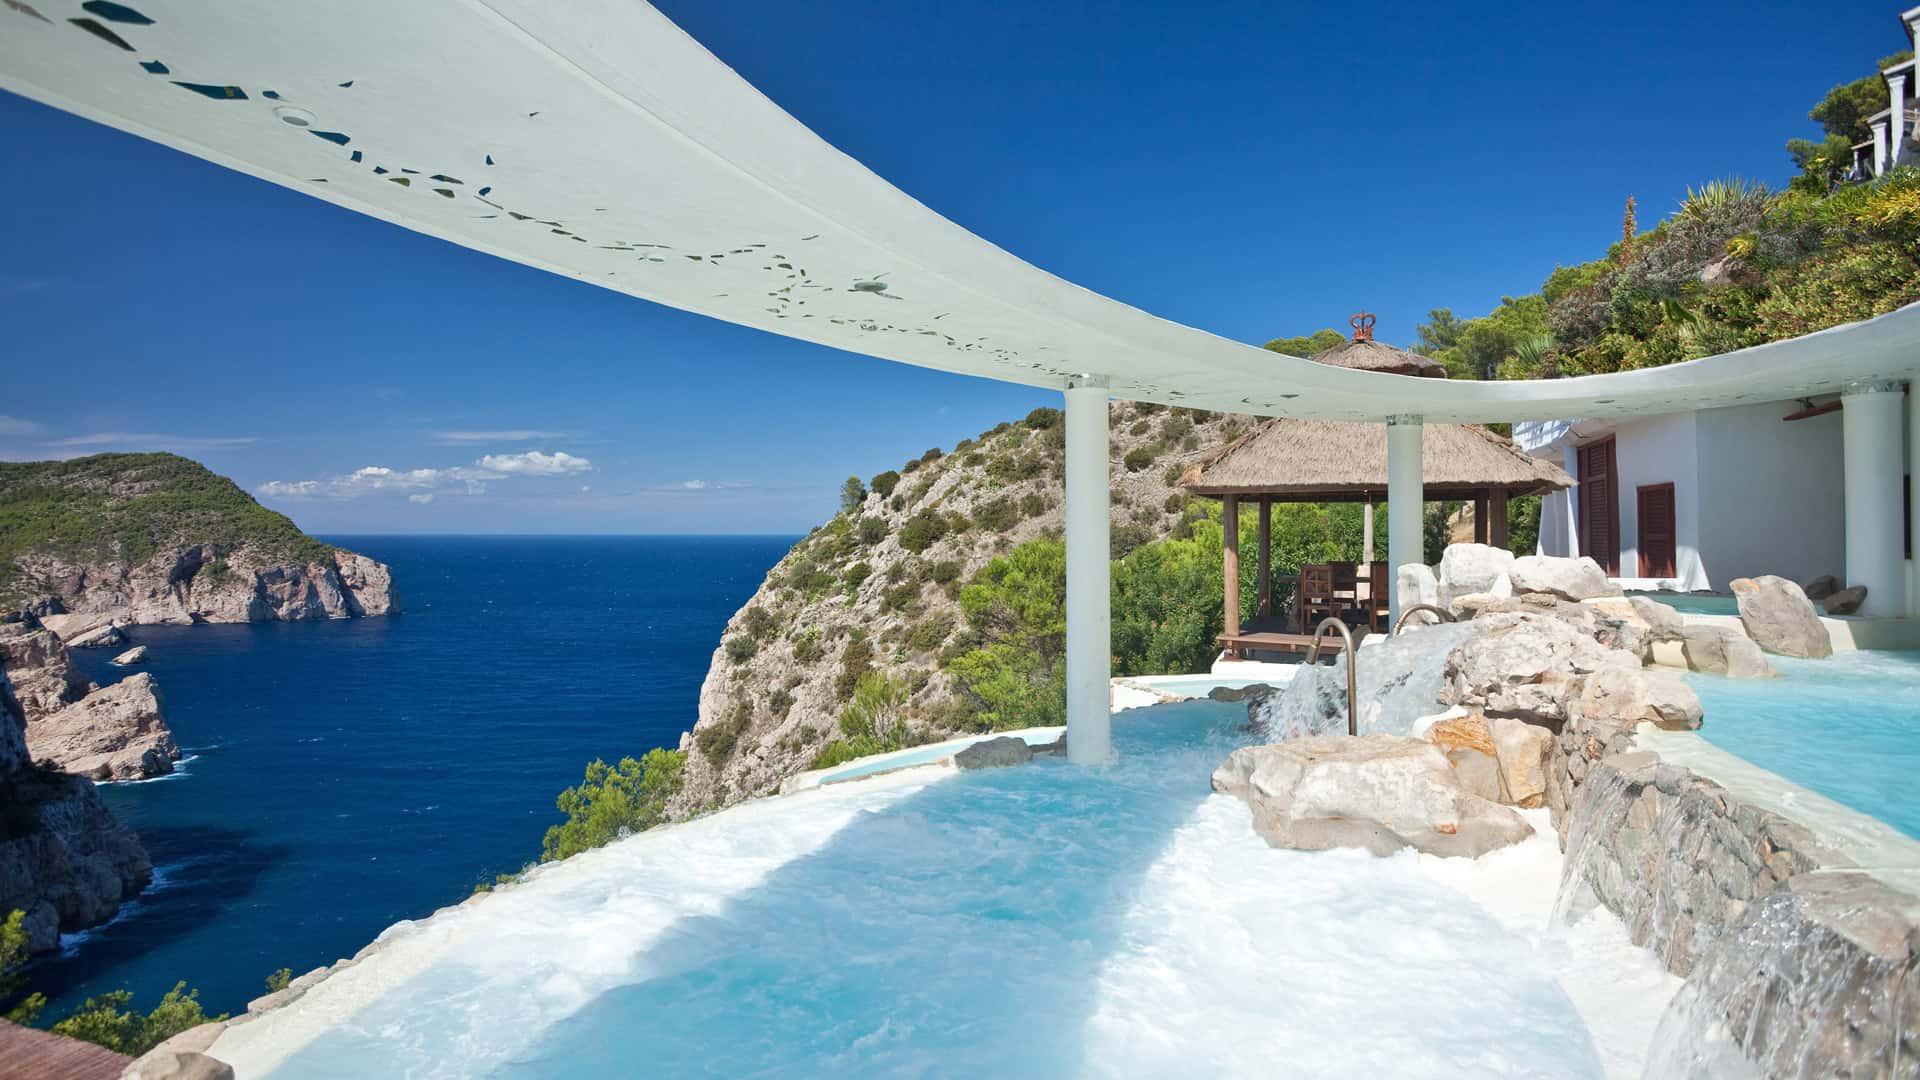 Exclusive-Escapes-Ibiza-Hotels-Leading-Hotels-of-the-World-Life-Style-Life-Luxury-Lifestyle-Beverly-Hills-Magazine-Travel-to-Ibiza